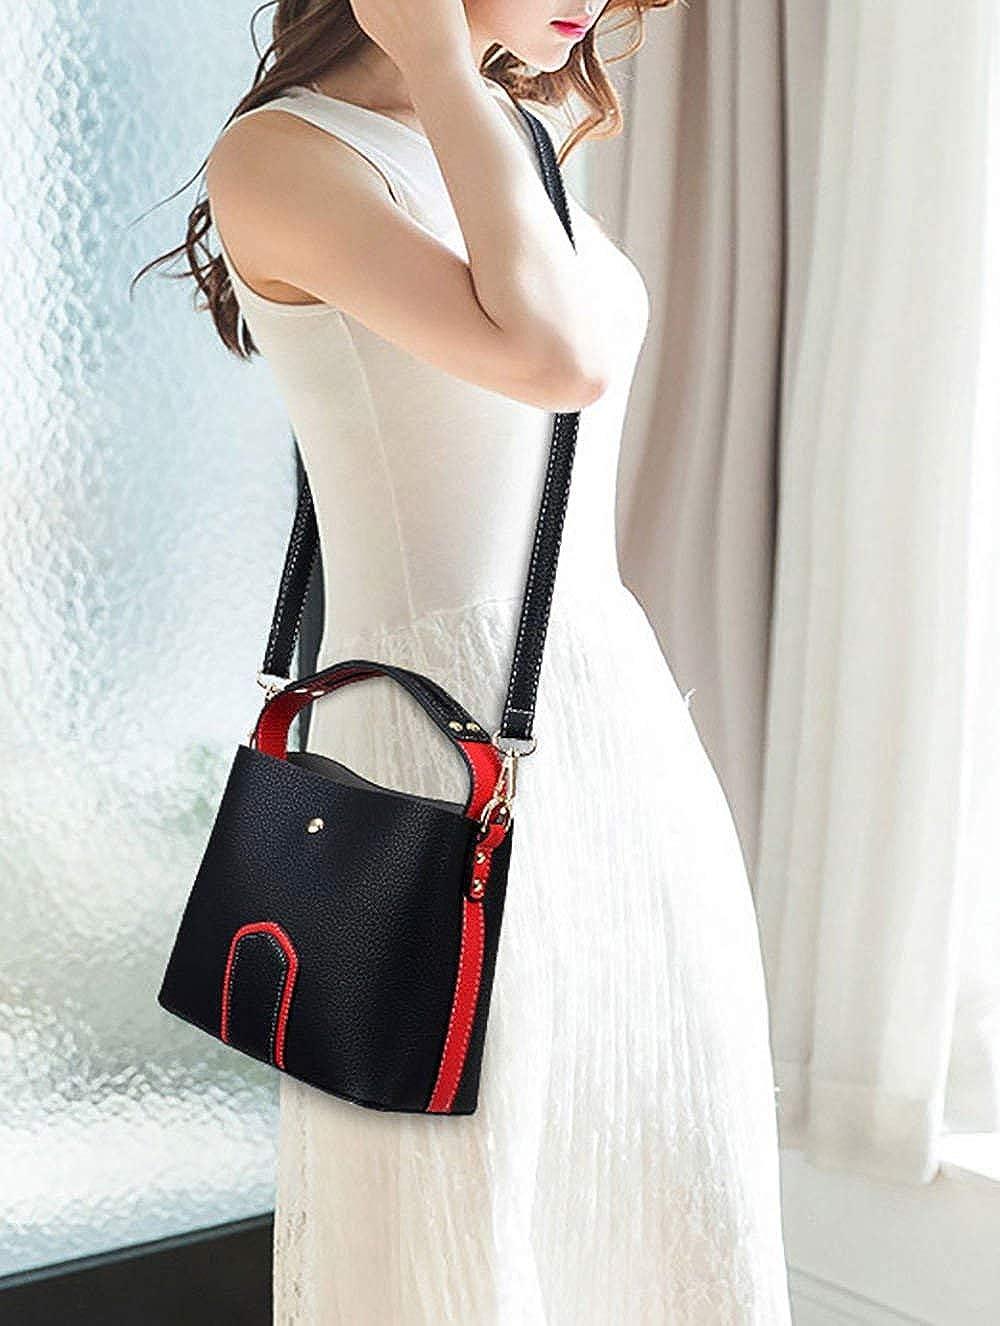 Zhao Liang Women Shoulder Bags Handbags Totes PU Leather Purses Satchels Top-Handle